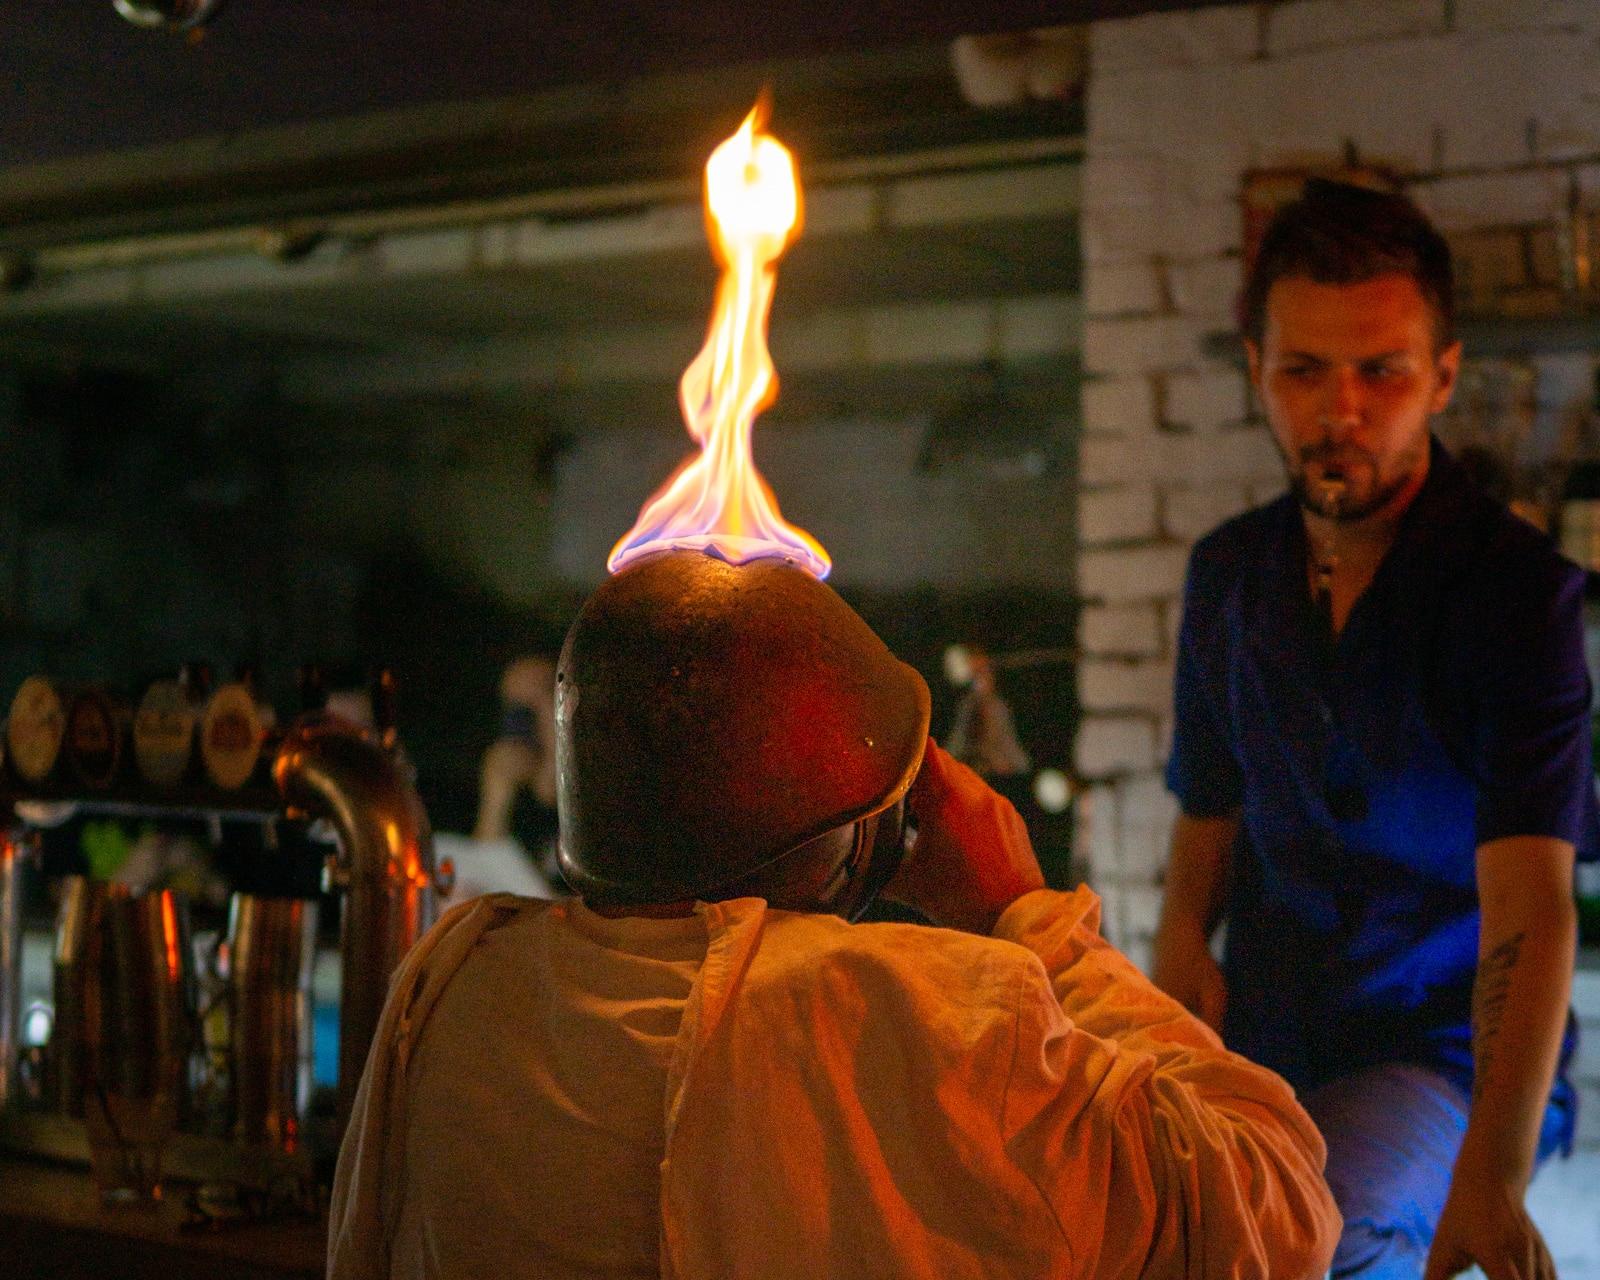 Casco rodado en el bar Palata No 6 en Kiev, Ucrania